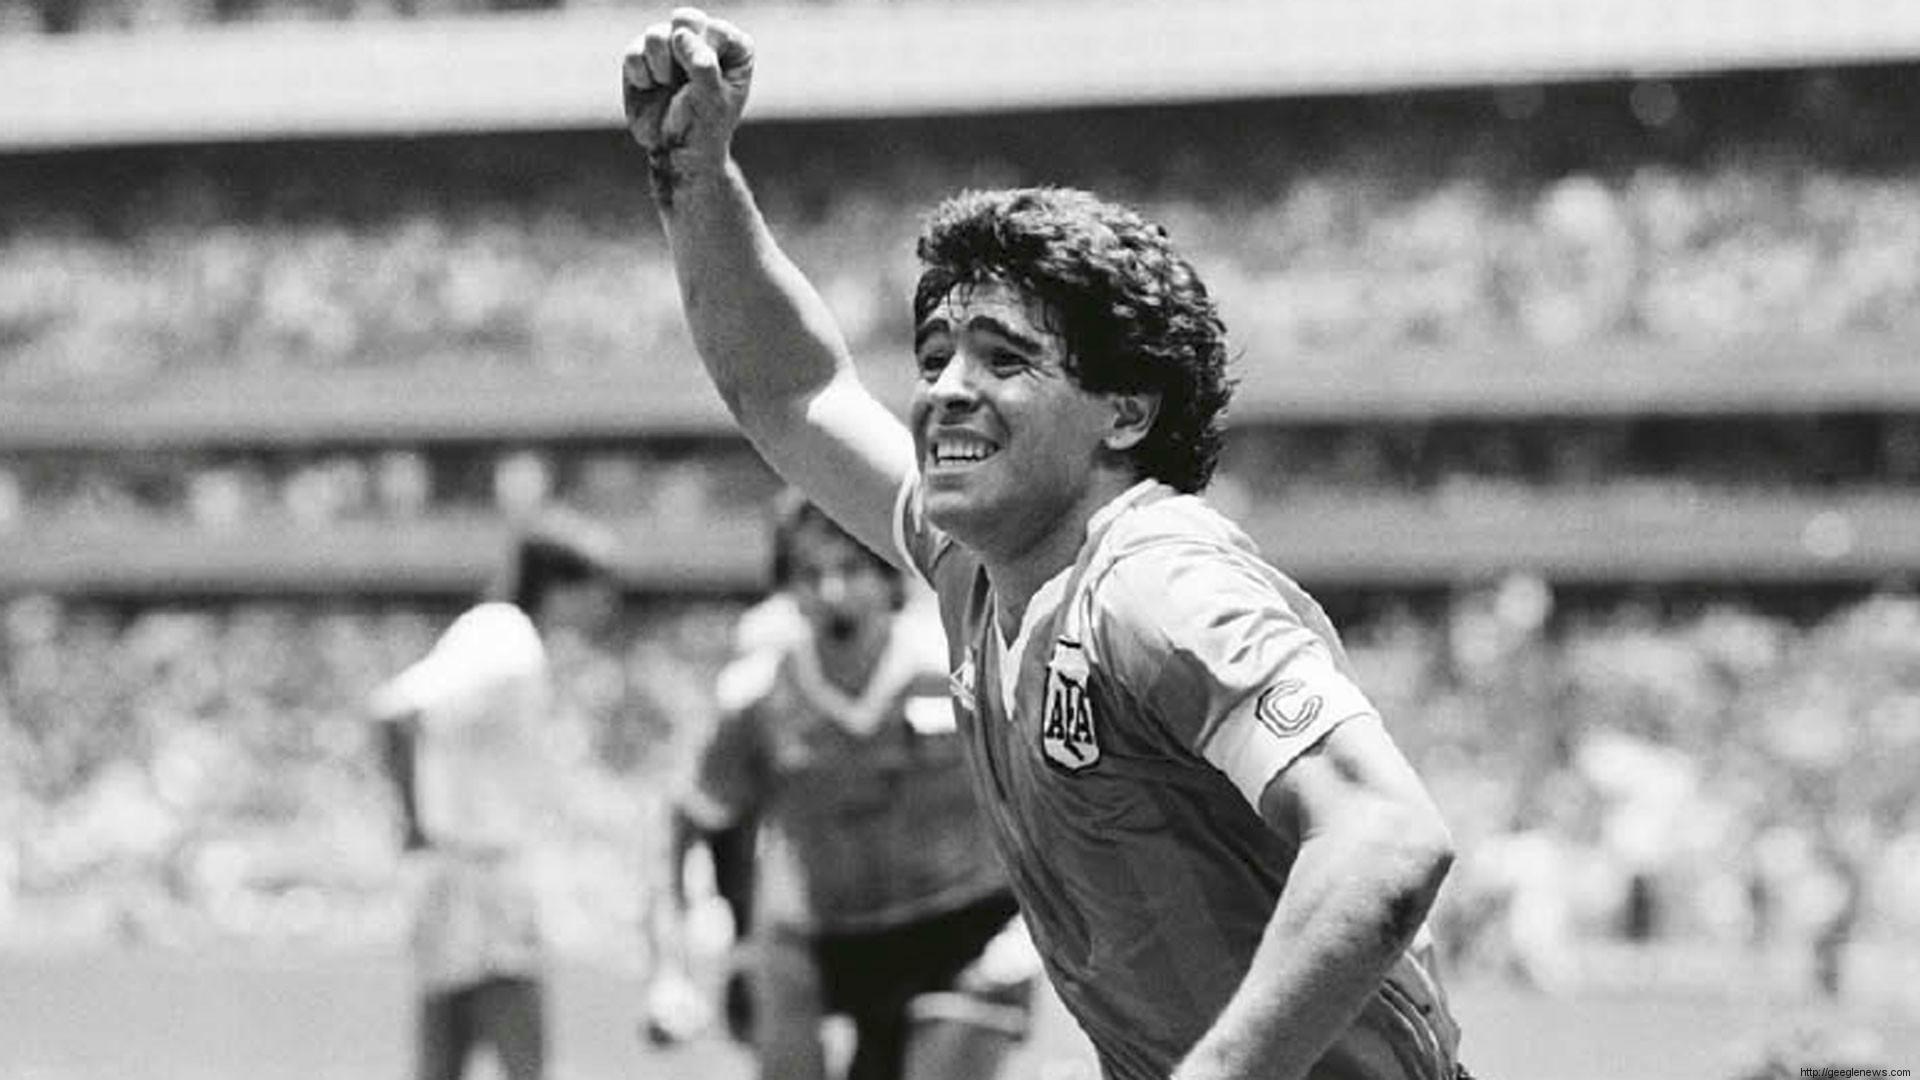 Diego Maradona Wallpaper Hd Desktop Images Iphones Diego Maradona Full Hd 1324765 Hd Wallpaper Backgrounds Download